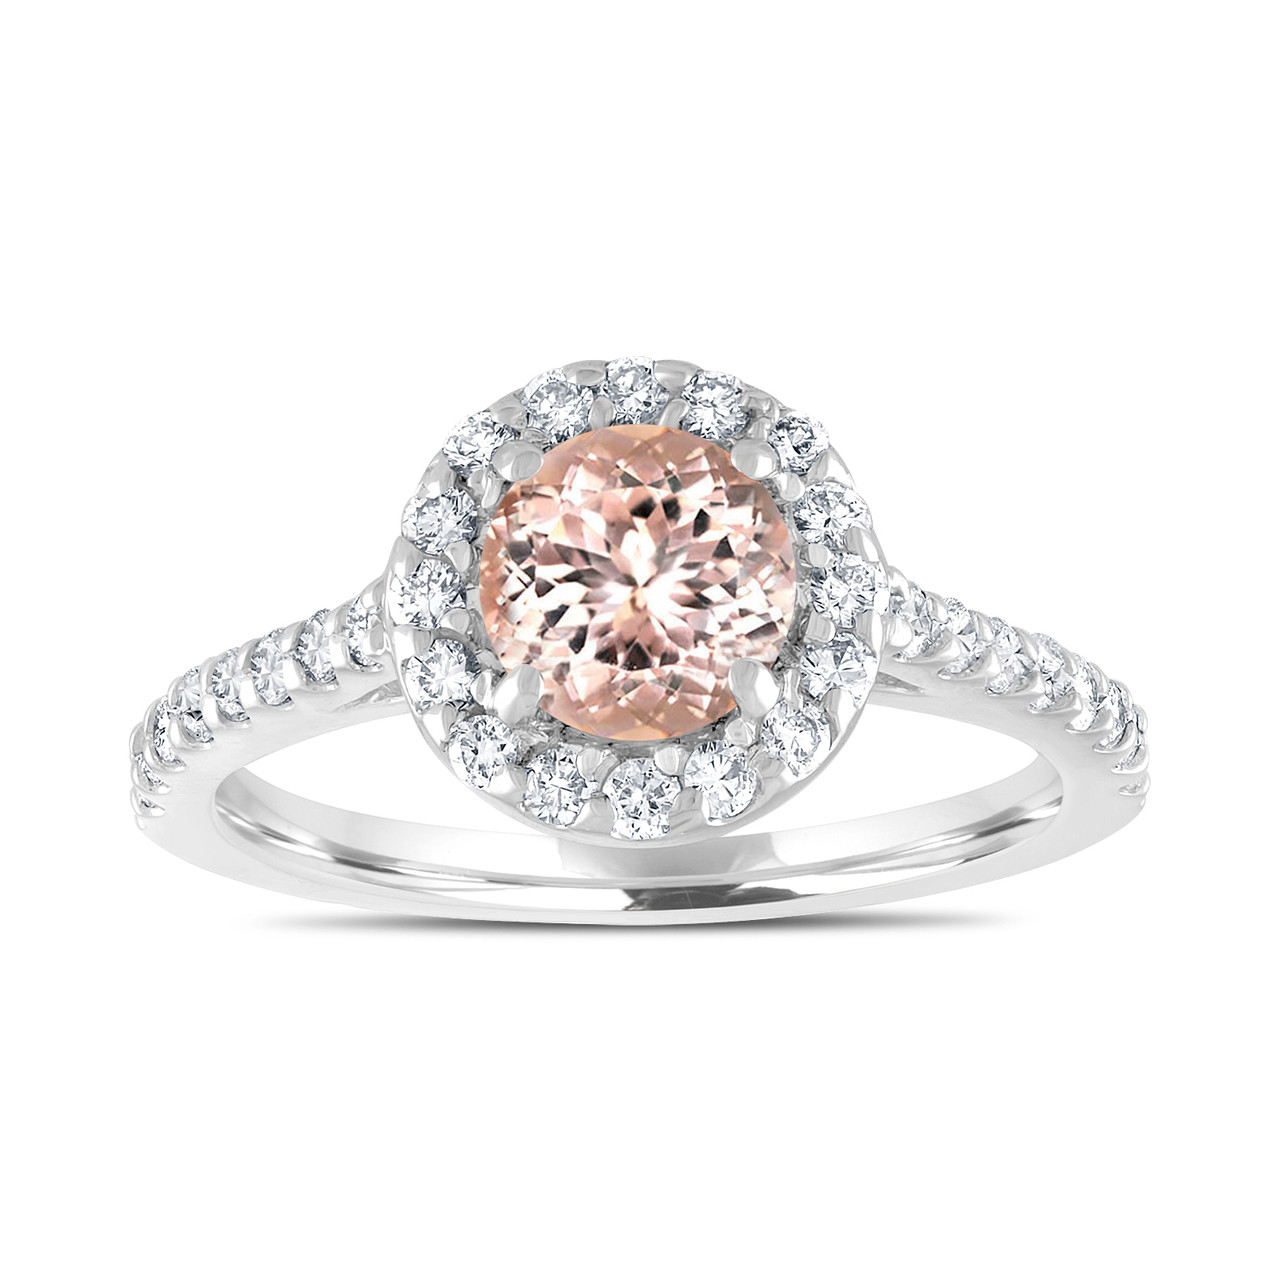 2 Band Diamond Wedding Engagement Proposal Set Ring: Platinum Morganite Engagement Ring, With Diamonds Bridal